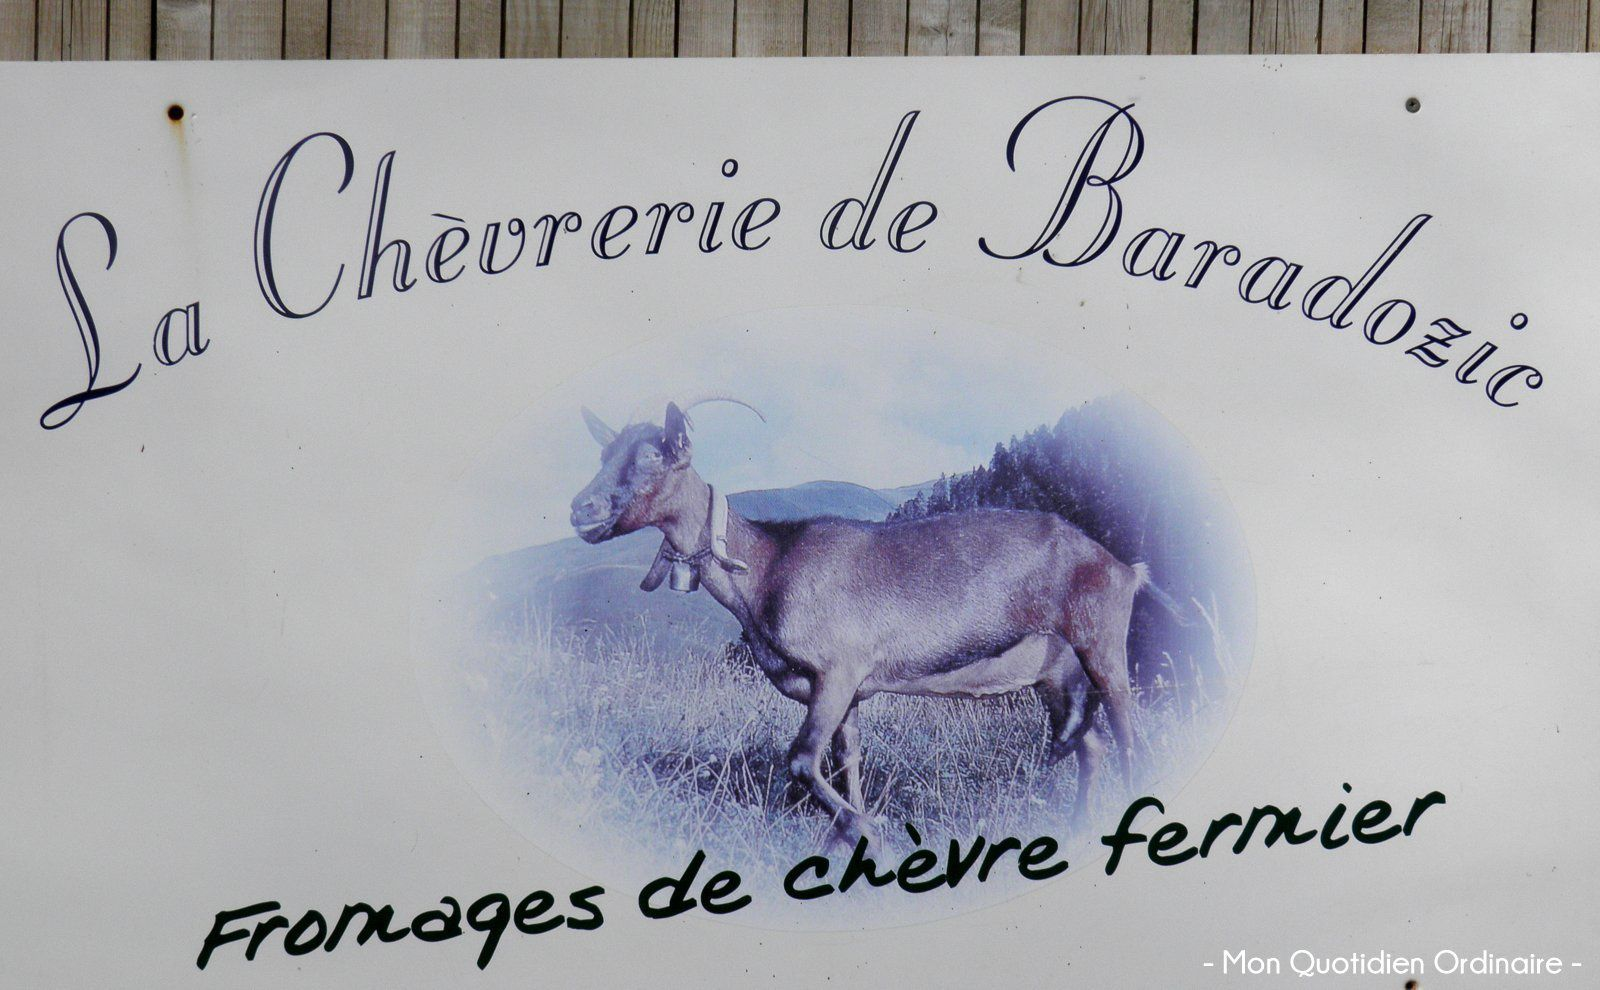 La jolie chèvrerie de Baradozic